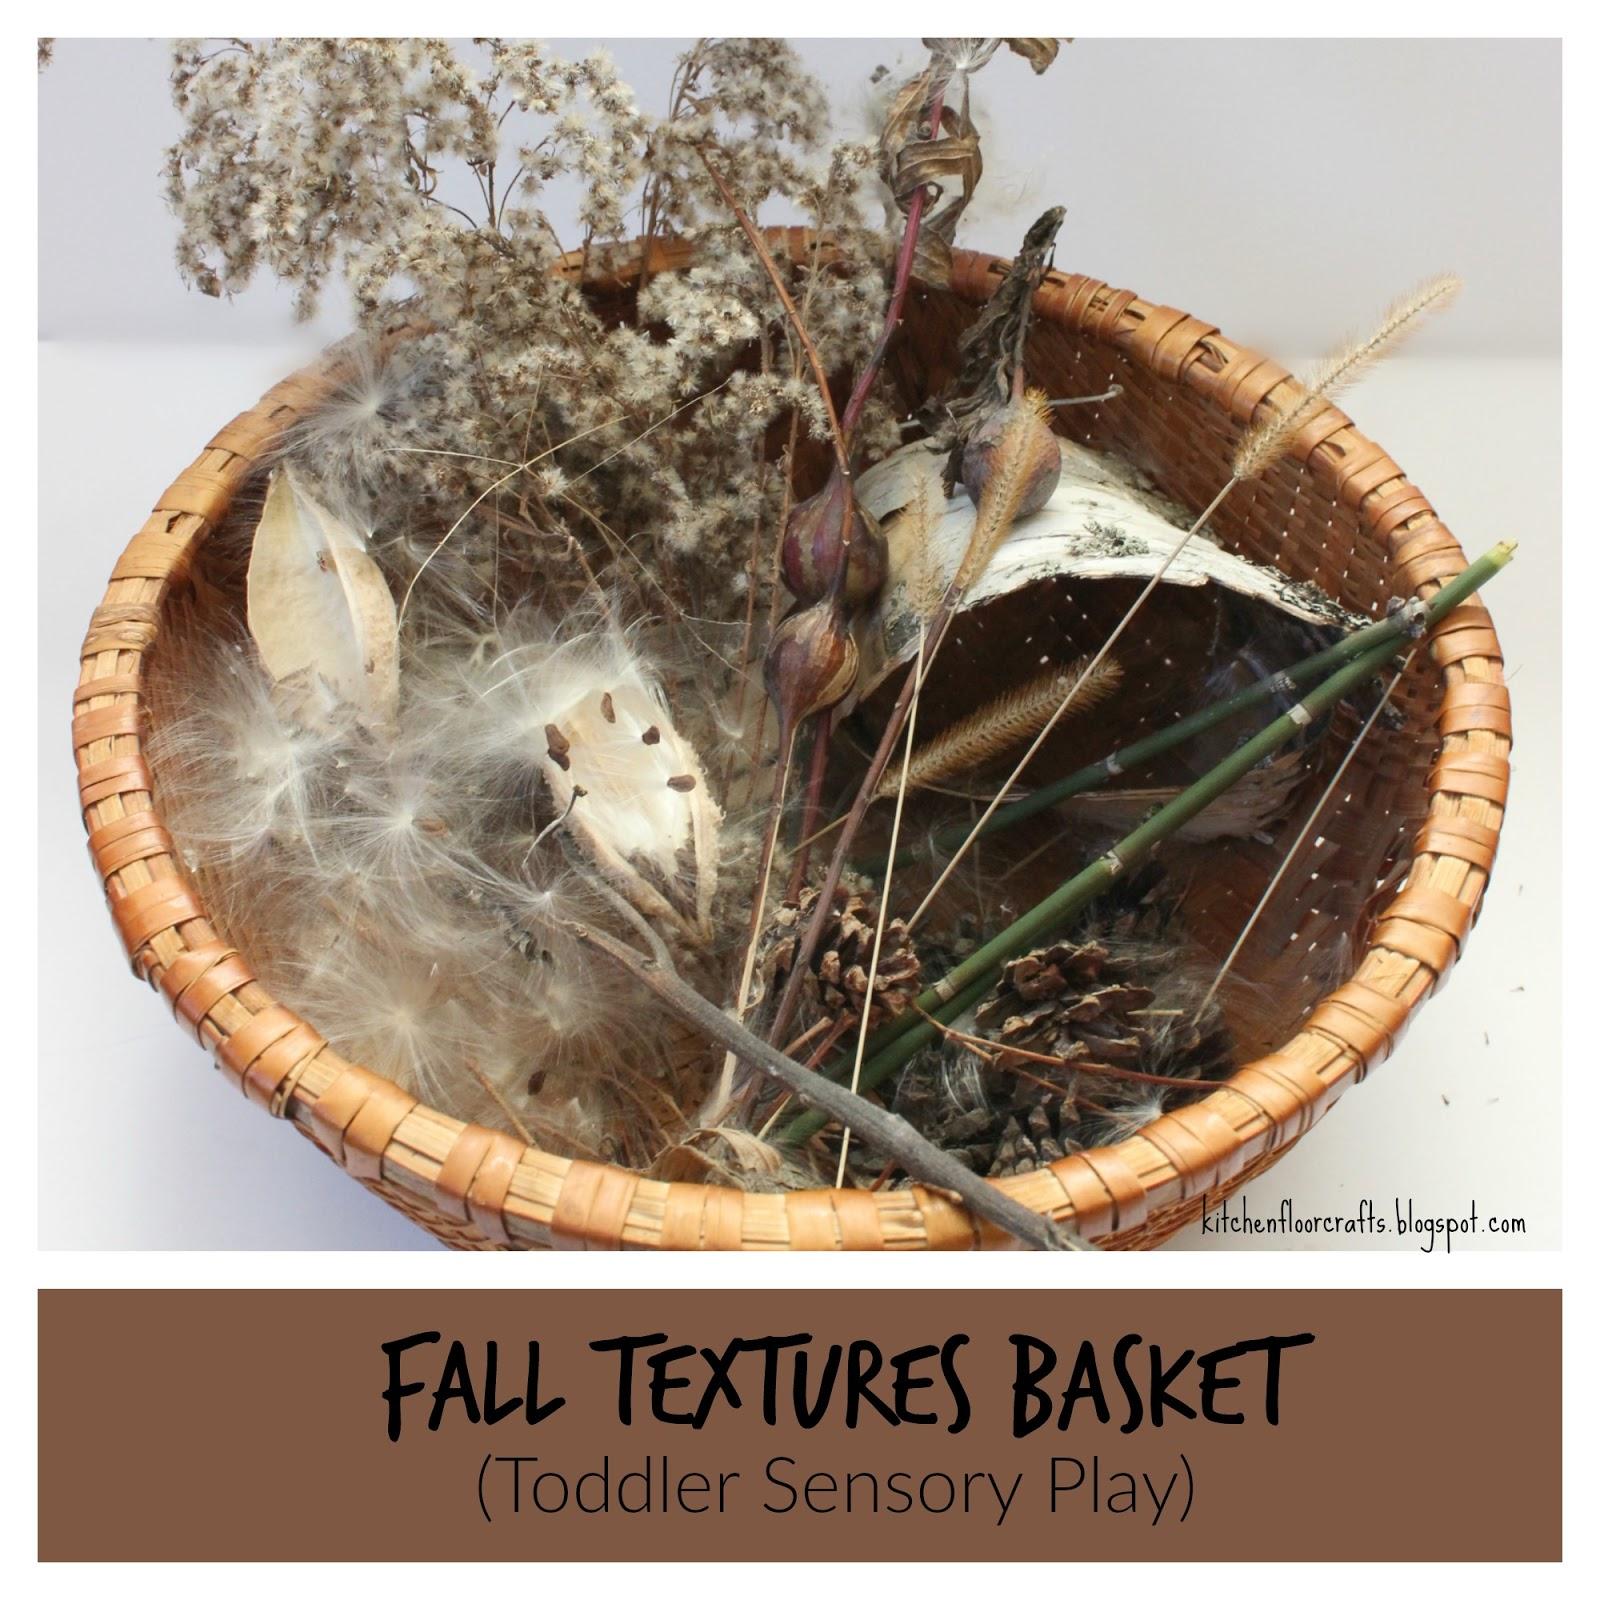 Fall Textures